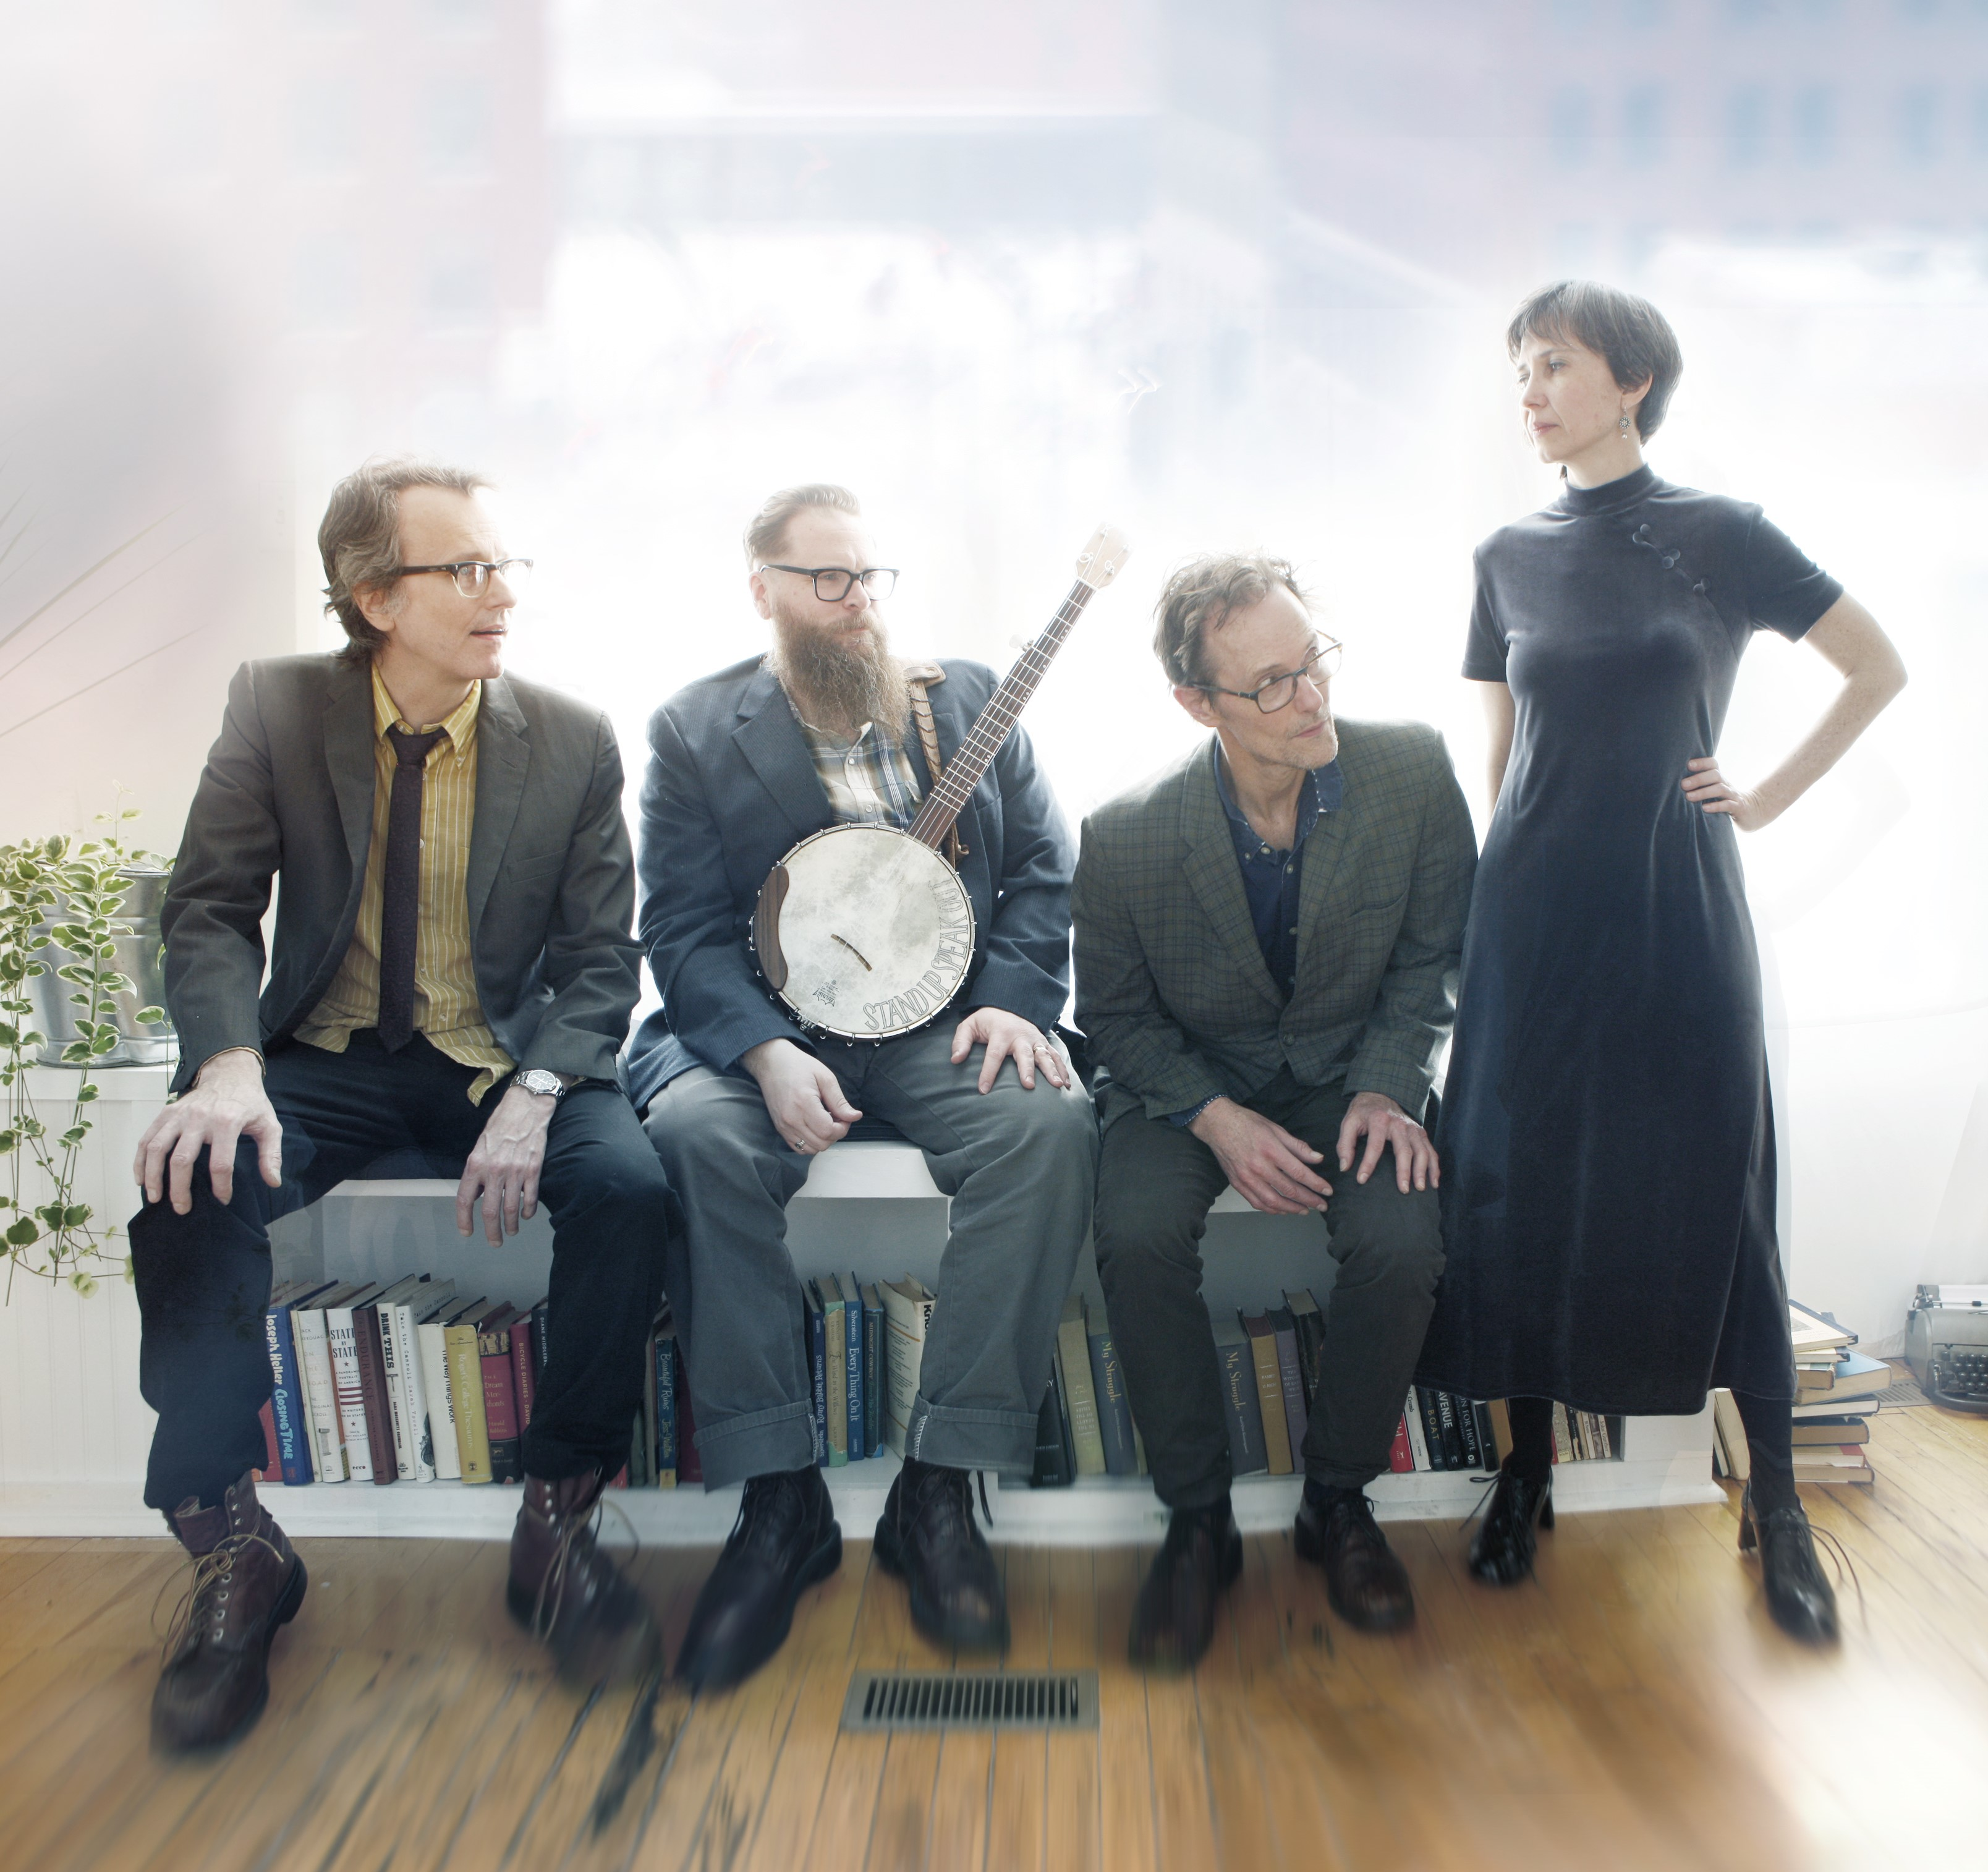 Matt Wilson & His Orchestra headline Space on Jan. 26.   Paul Irmiter